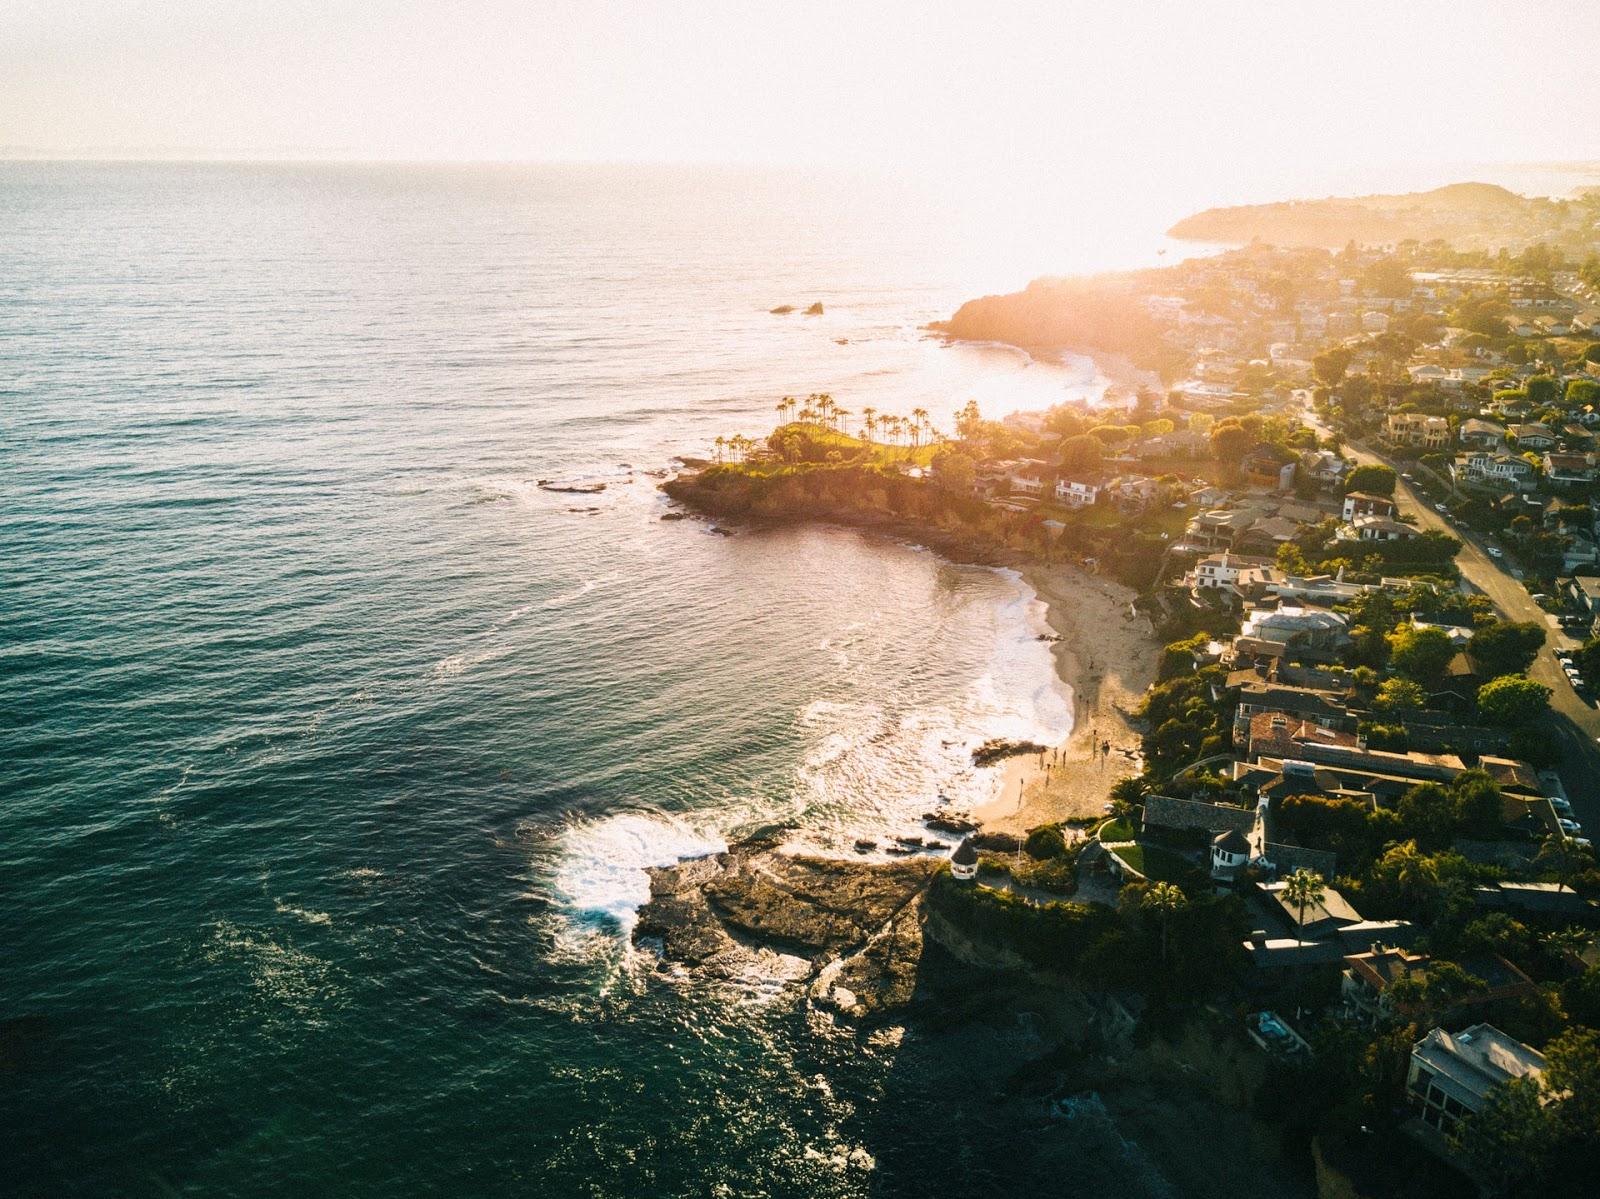 air view of Los Angeles beach shorline